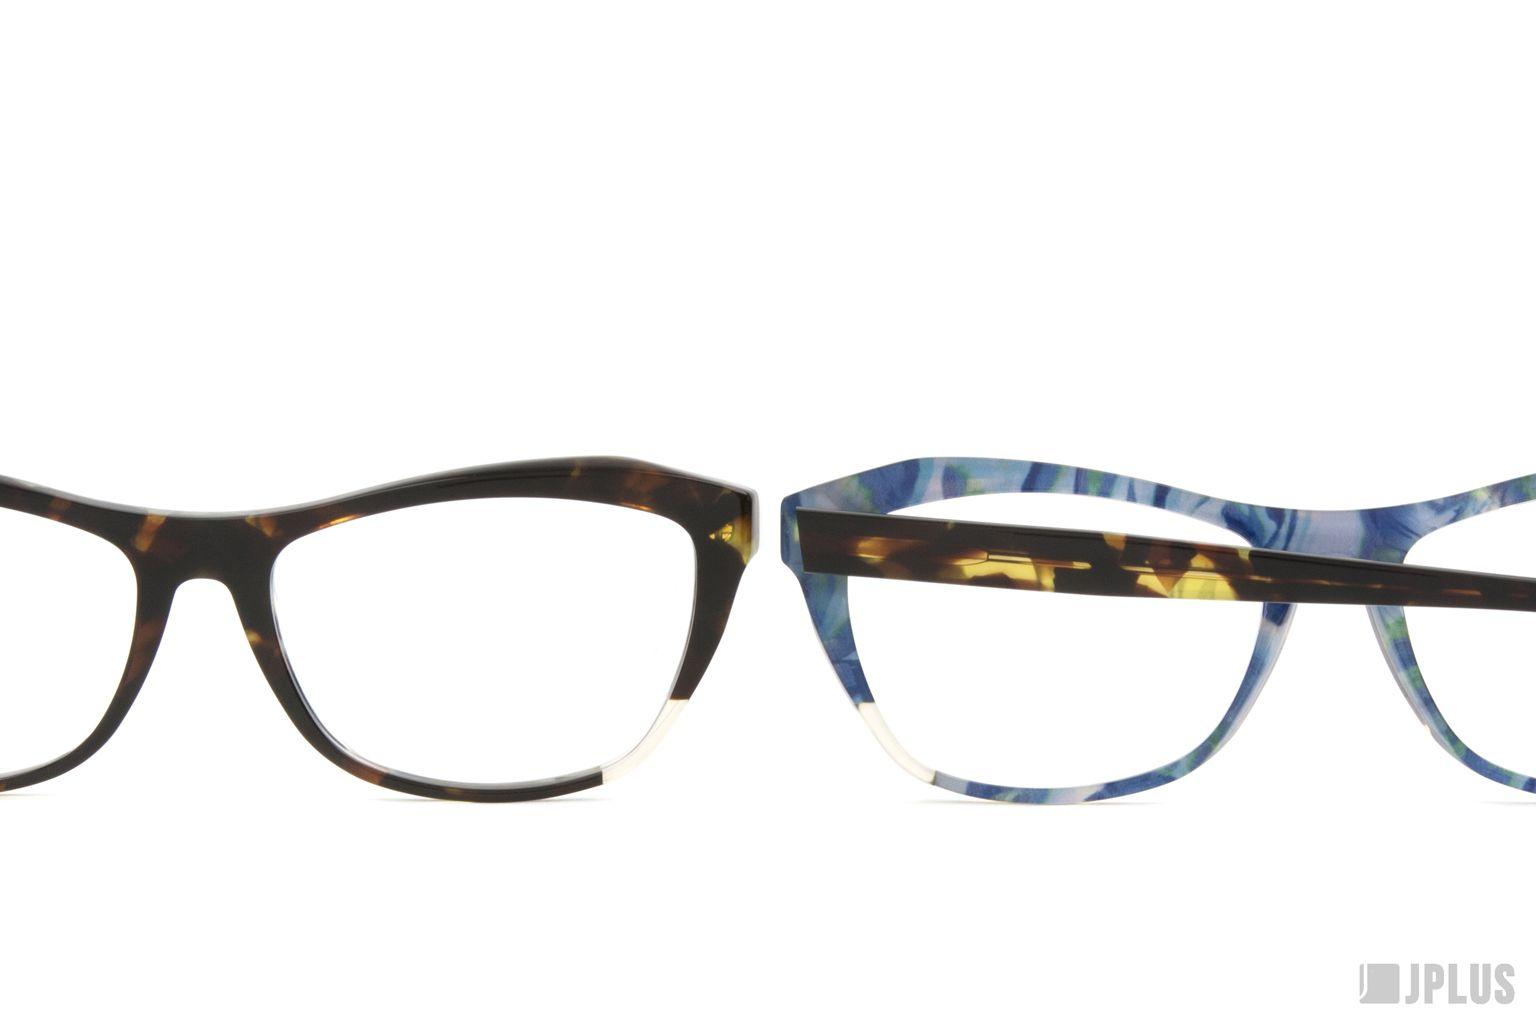 LOVE EDITION FW1415 NICOLE #love #moda #occhiali #fashion #eyewear #eyeglasses #eyeframes #eyeshadows #vintage #cool #design #spectacle #JPLUS #madeinitaly www.jplus.it